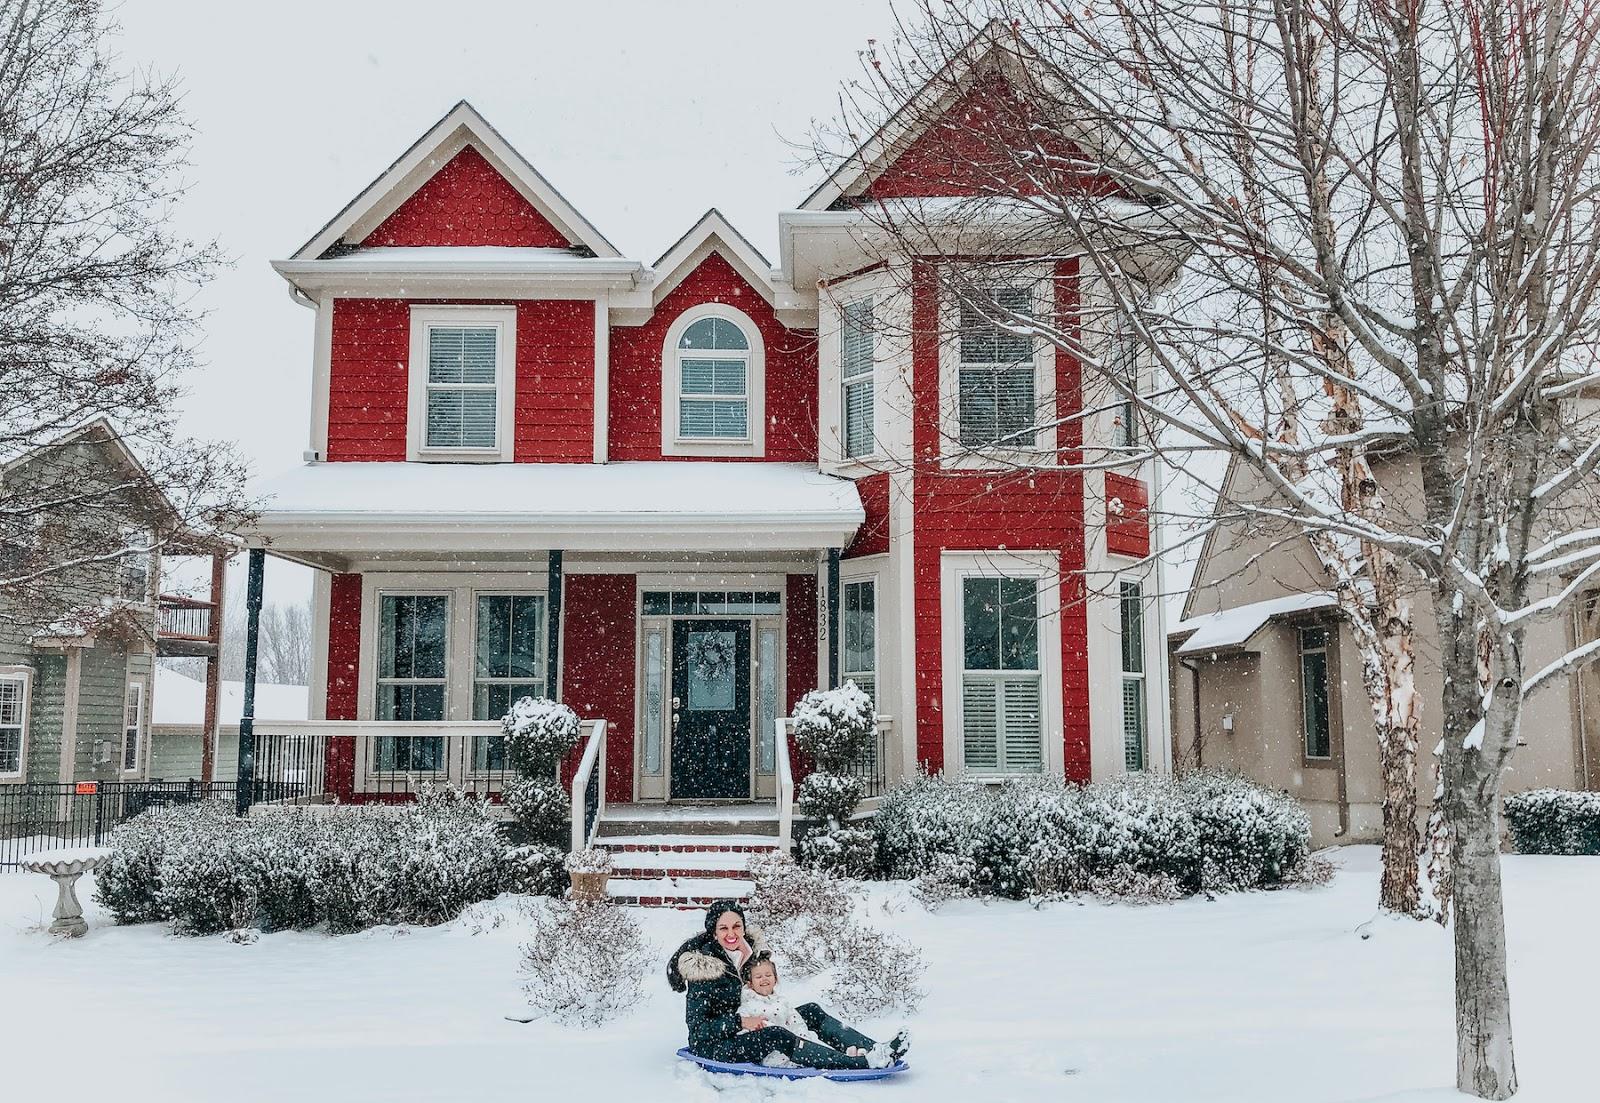 Sugar Cookies + Hot Chocolate + Winter Wonderland